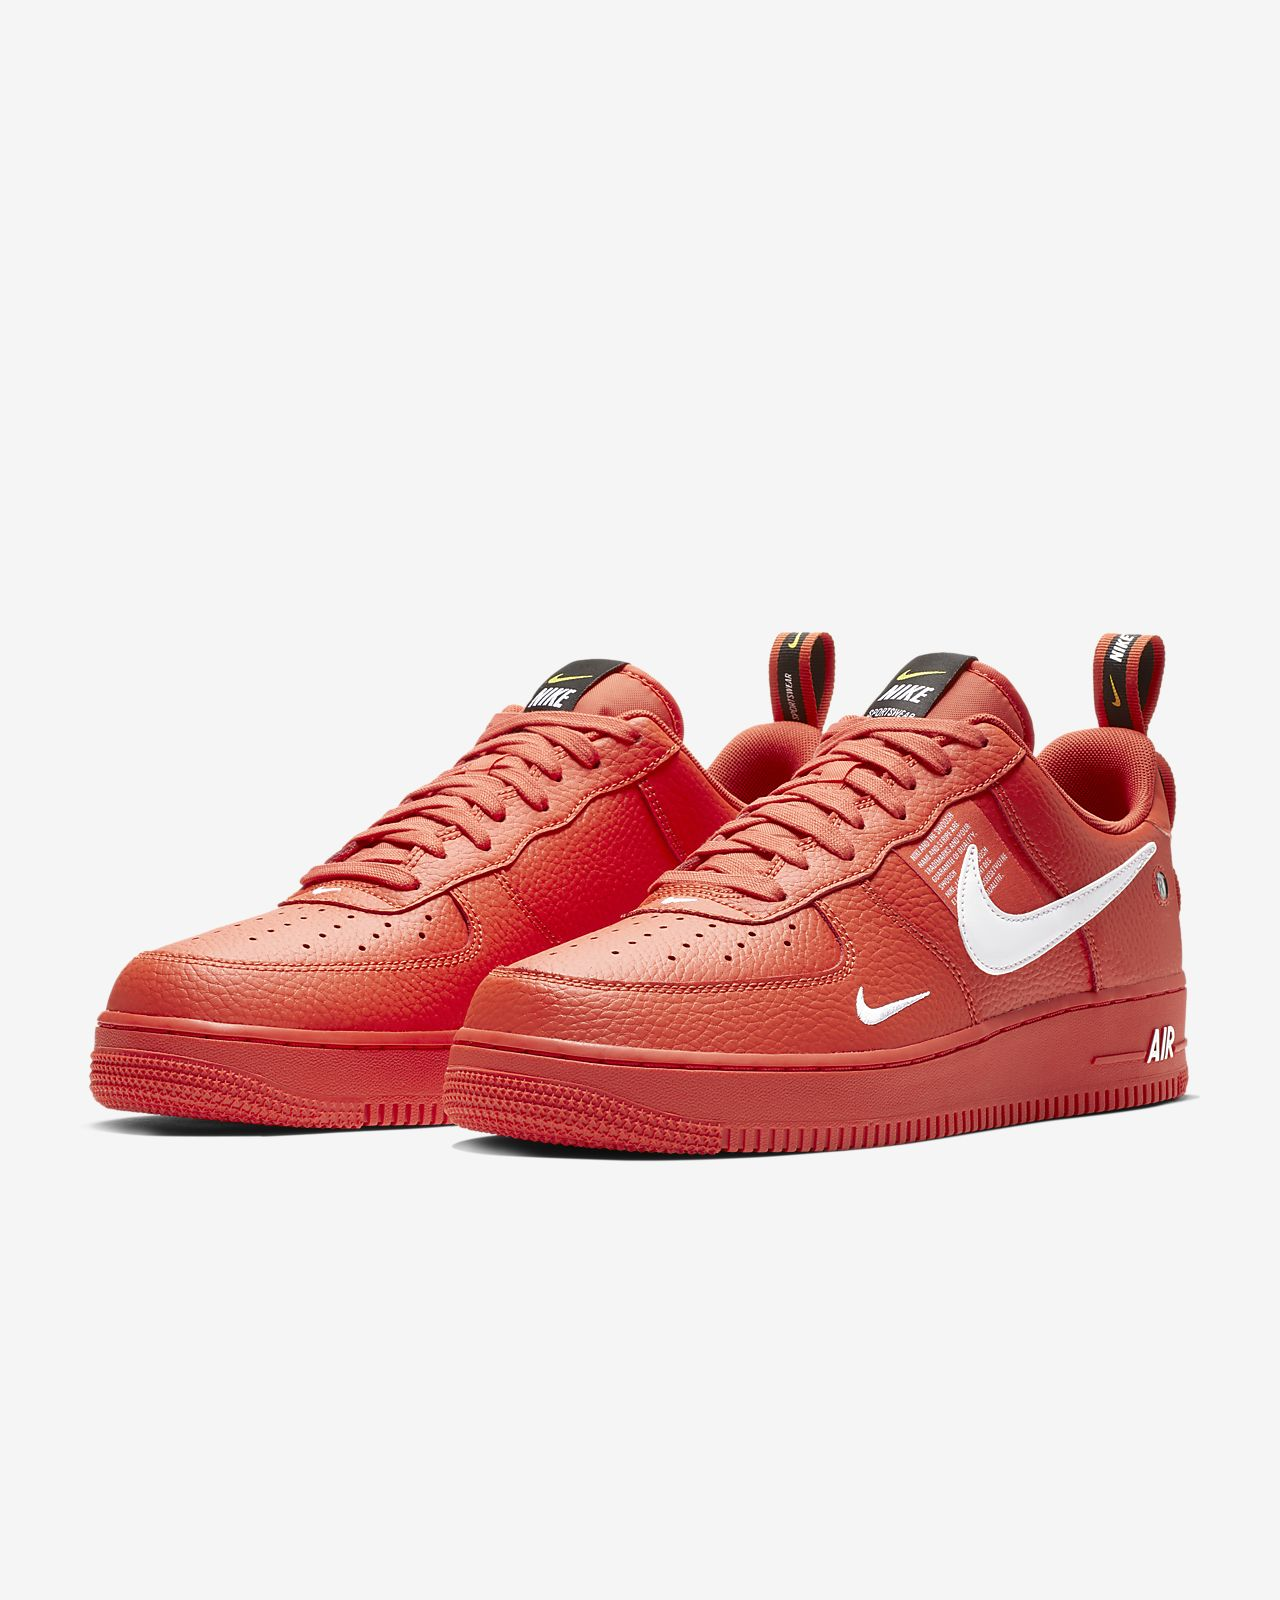 half off bc99c c4a44 ... Nike Air Force 1  07 LV8 Utility Men s Shoe